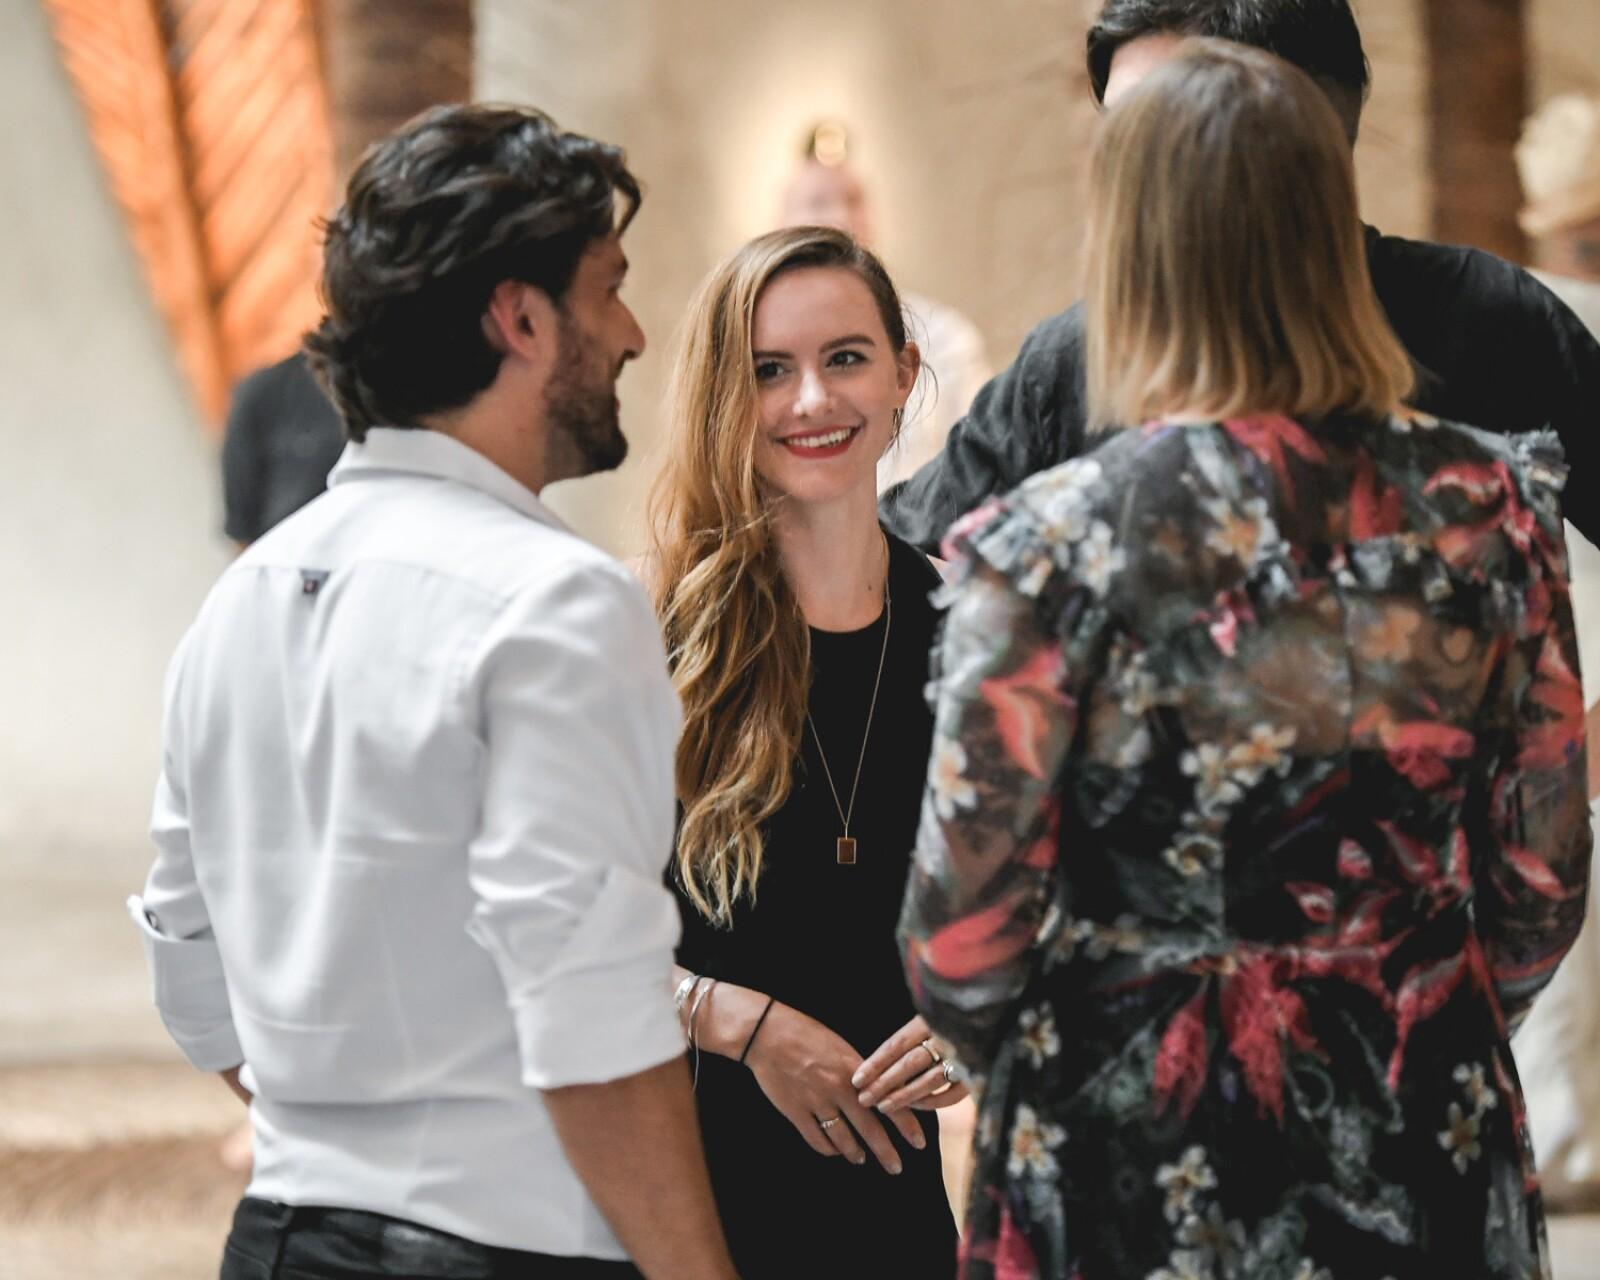 Sebastián Ávila Neira, Bianca Bondi y Claudia Paetzold.jpg